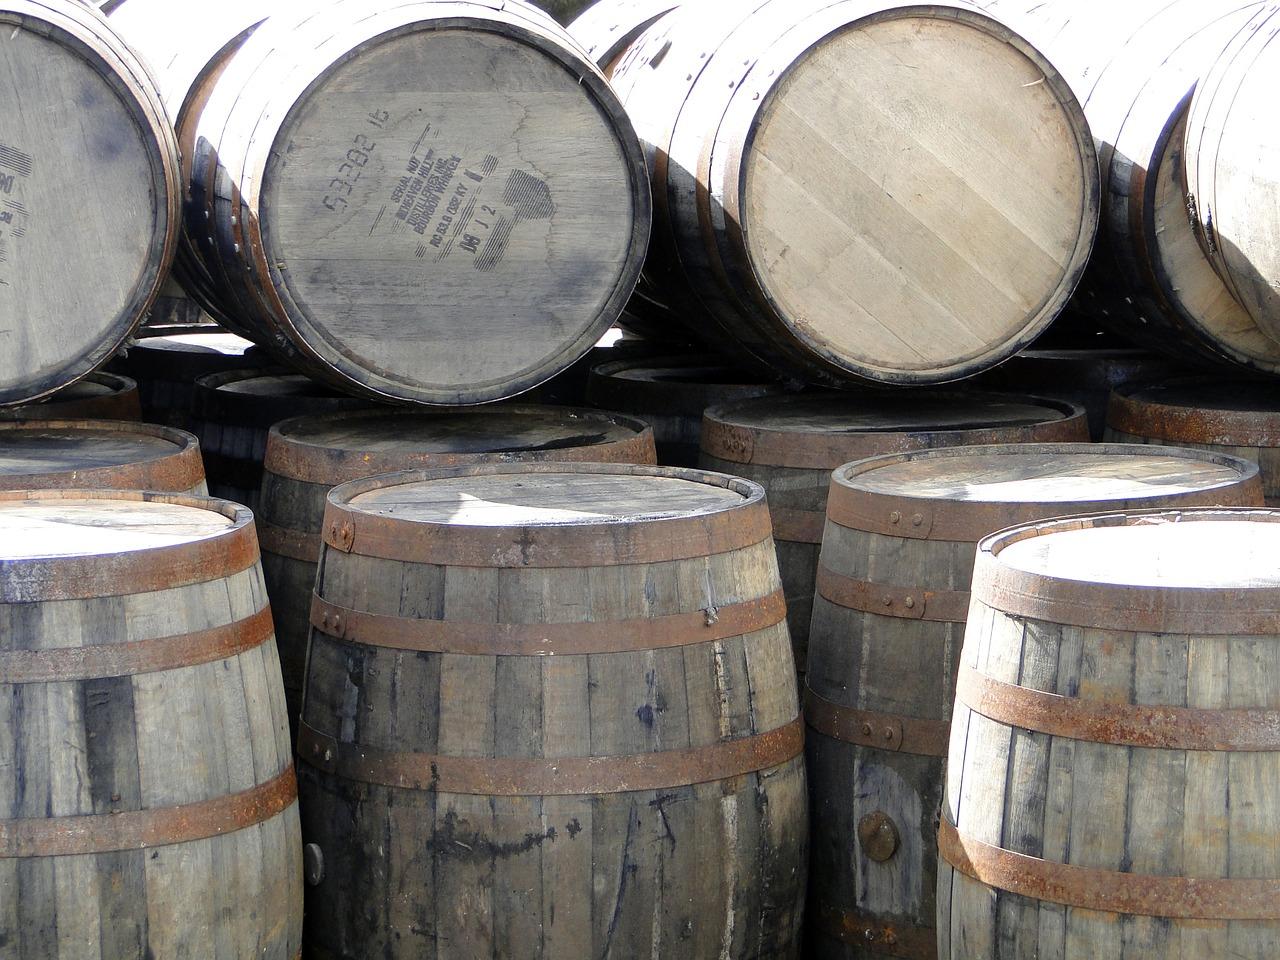 whiskey-barrels-667387_1280